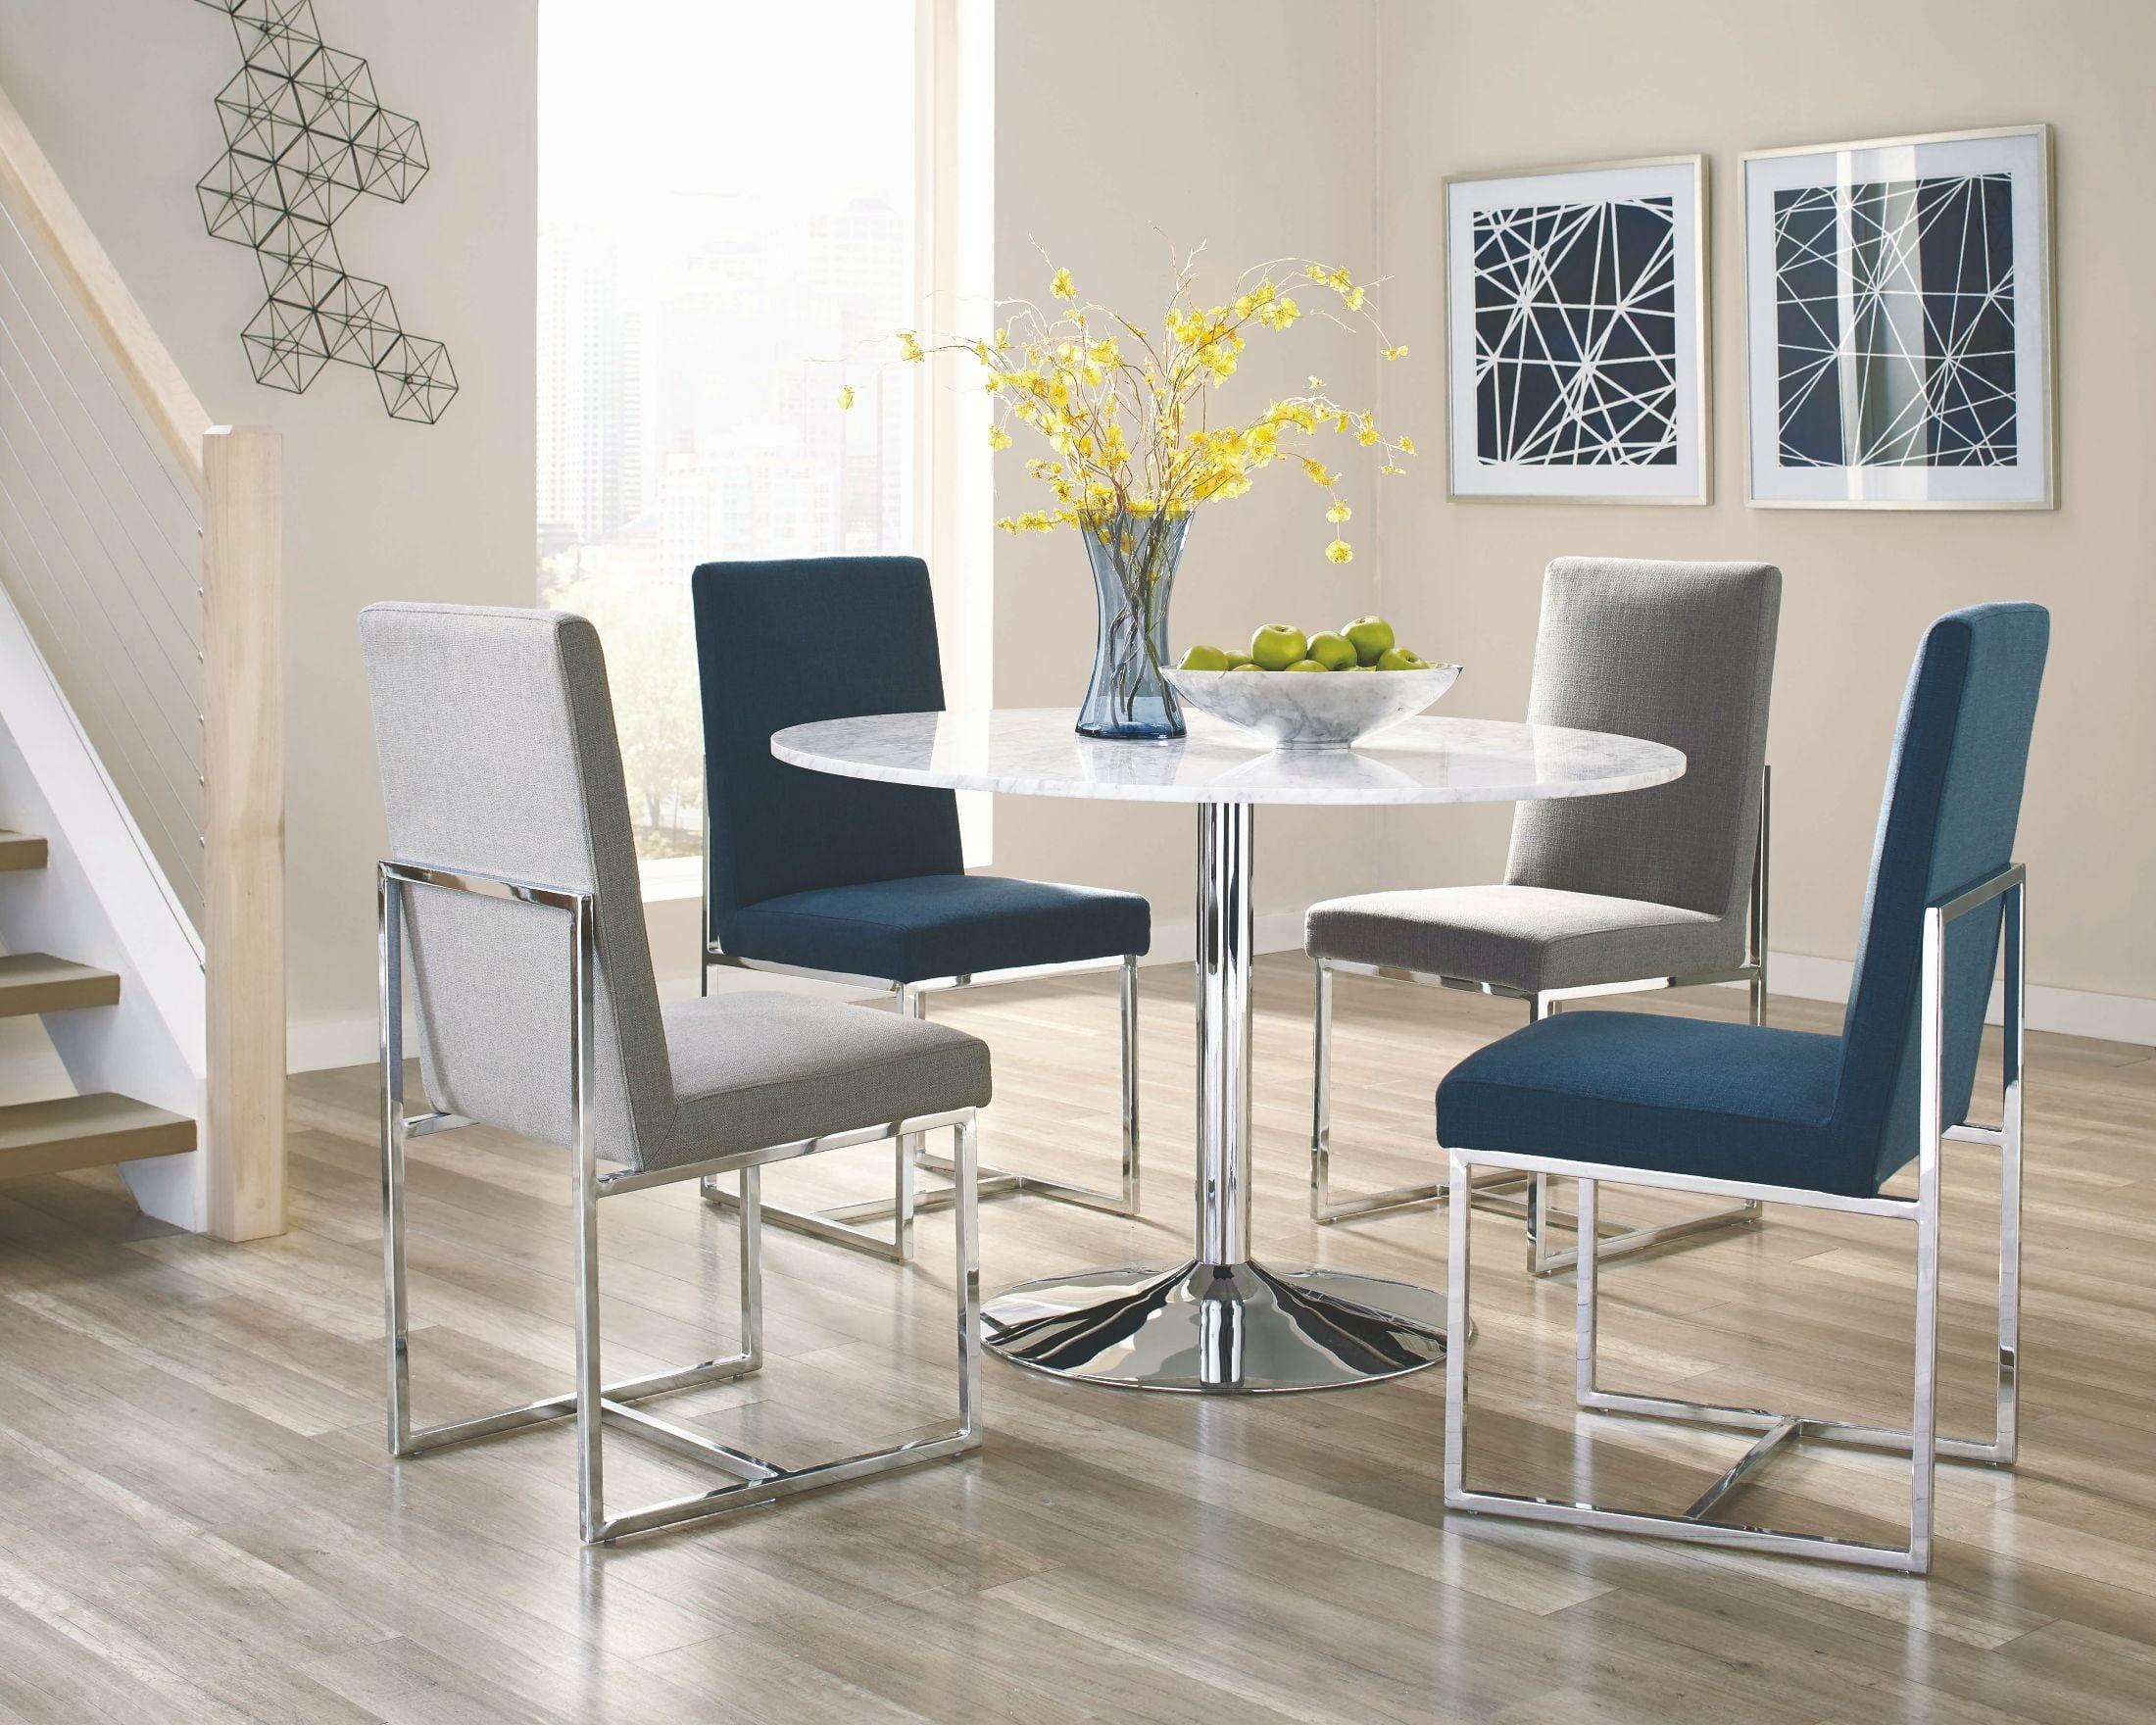 Mackinnon White Carrara Marble Round Dining Room Set from Coaster ...